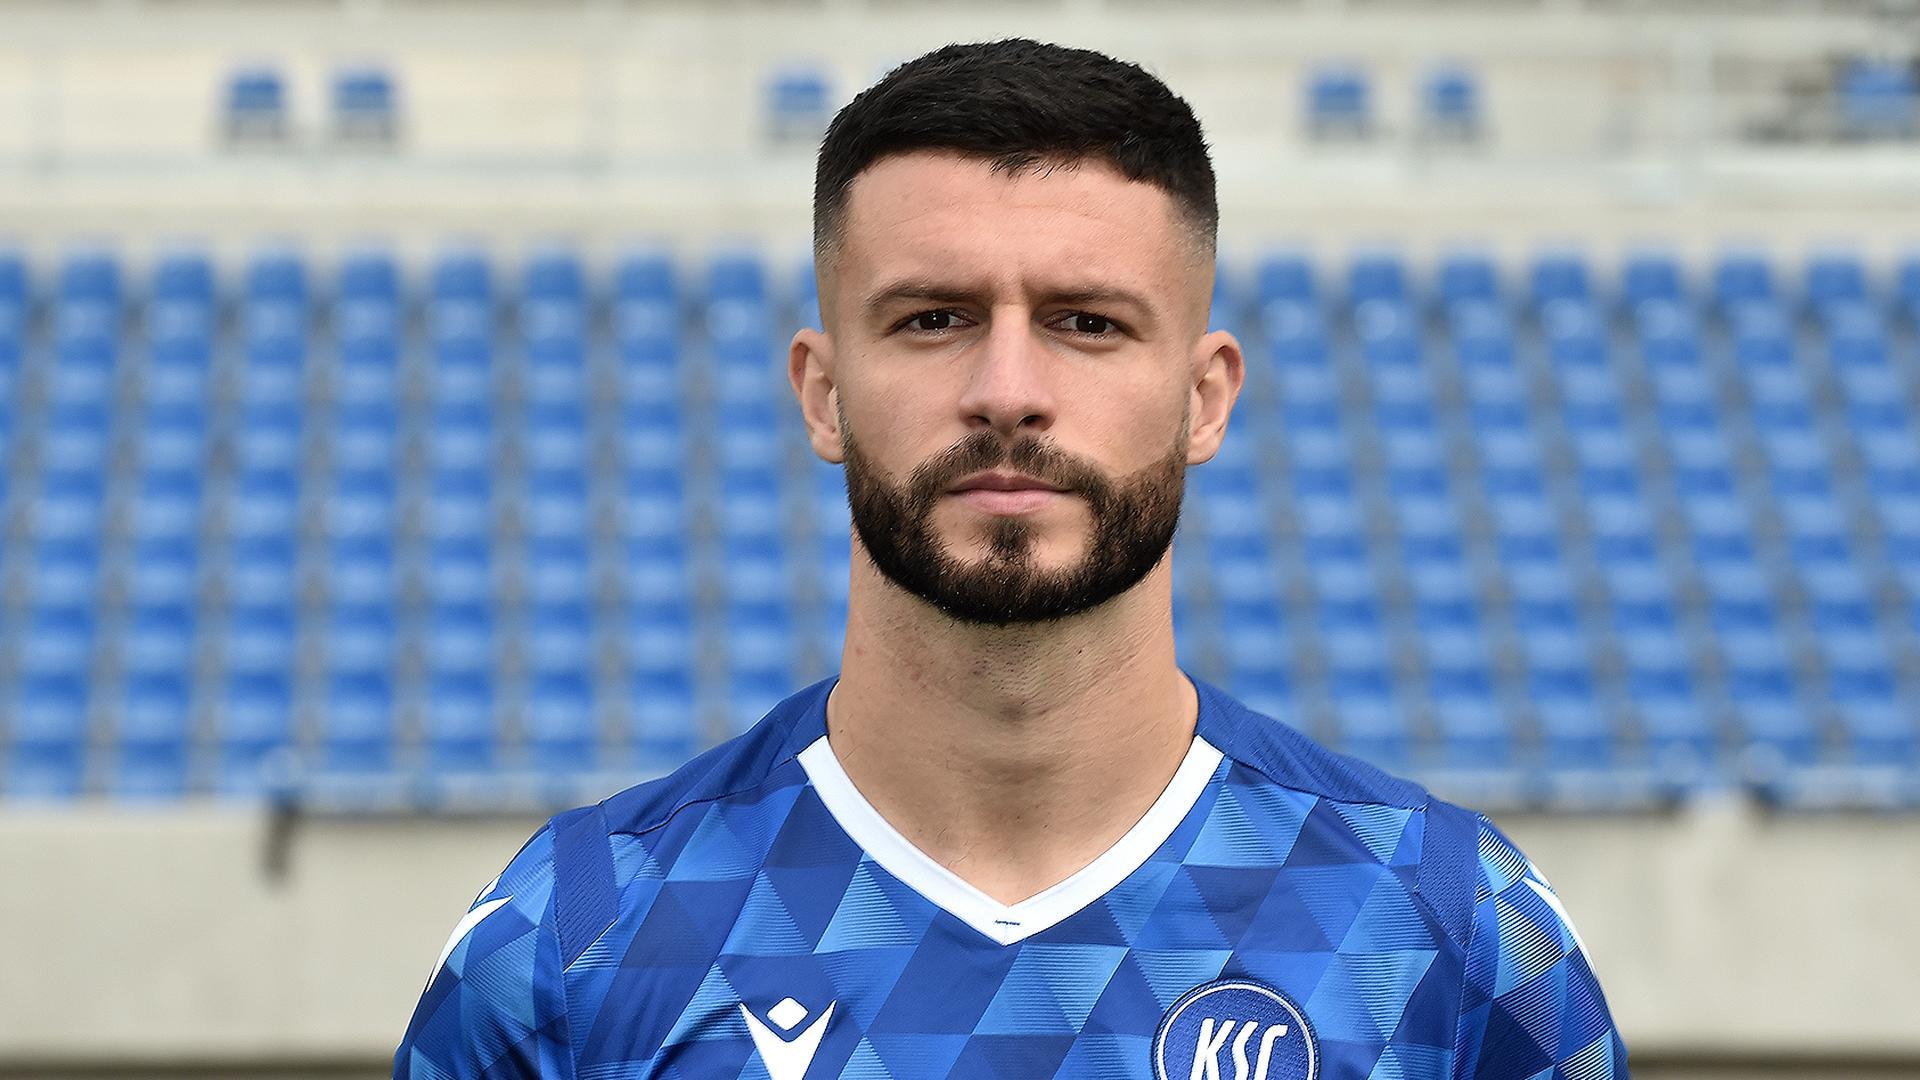 KSC Spieler Marco Djuricin aus der Saison 2020/2021